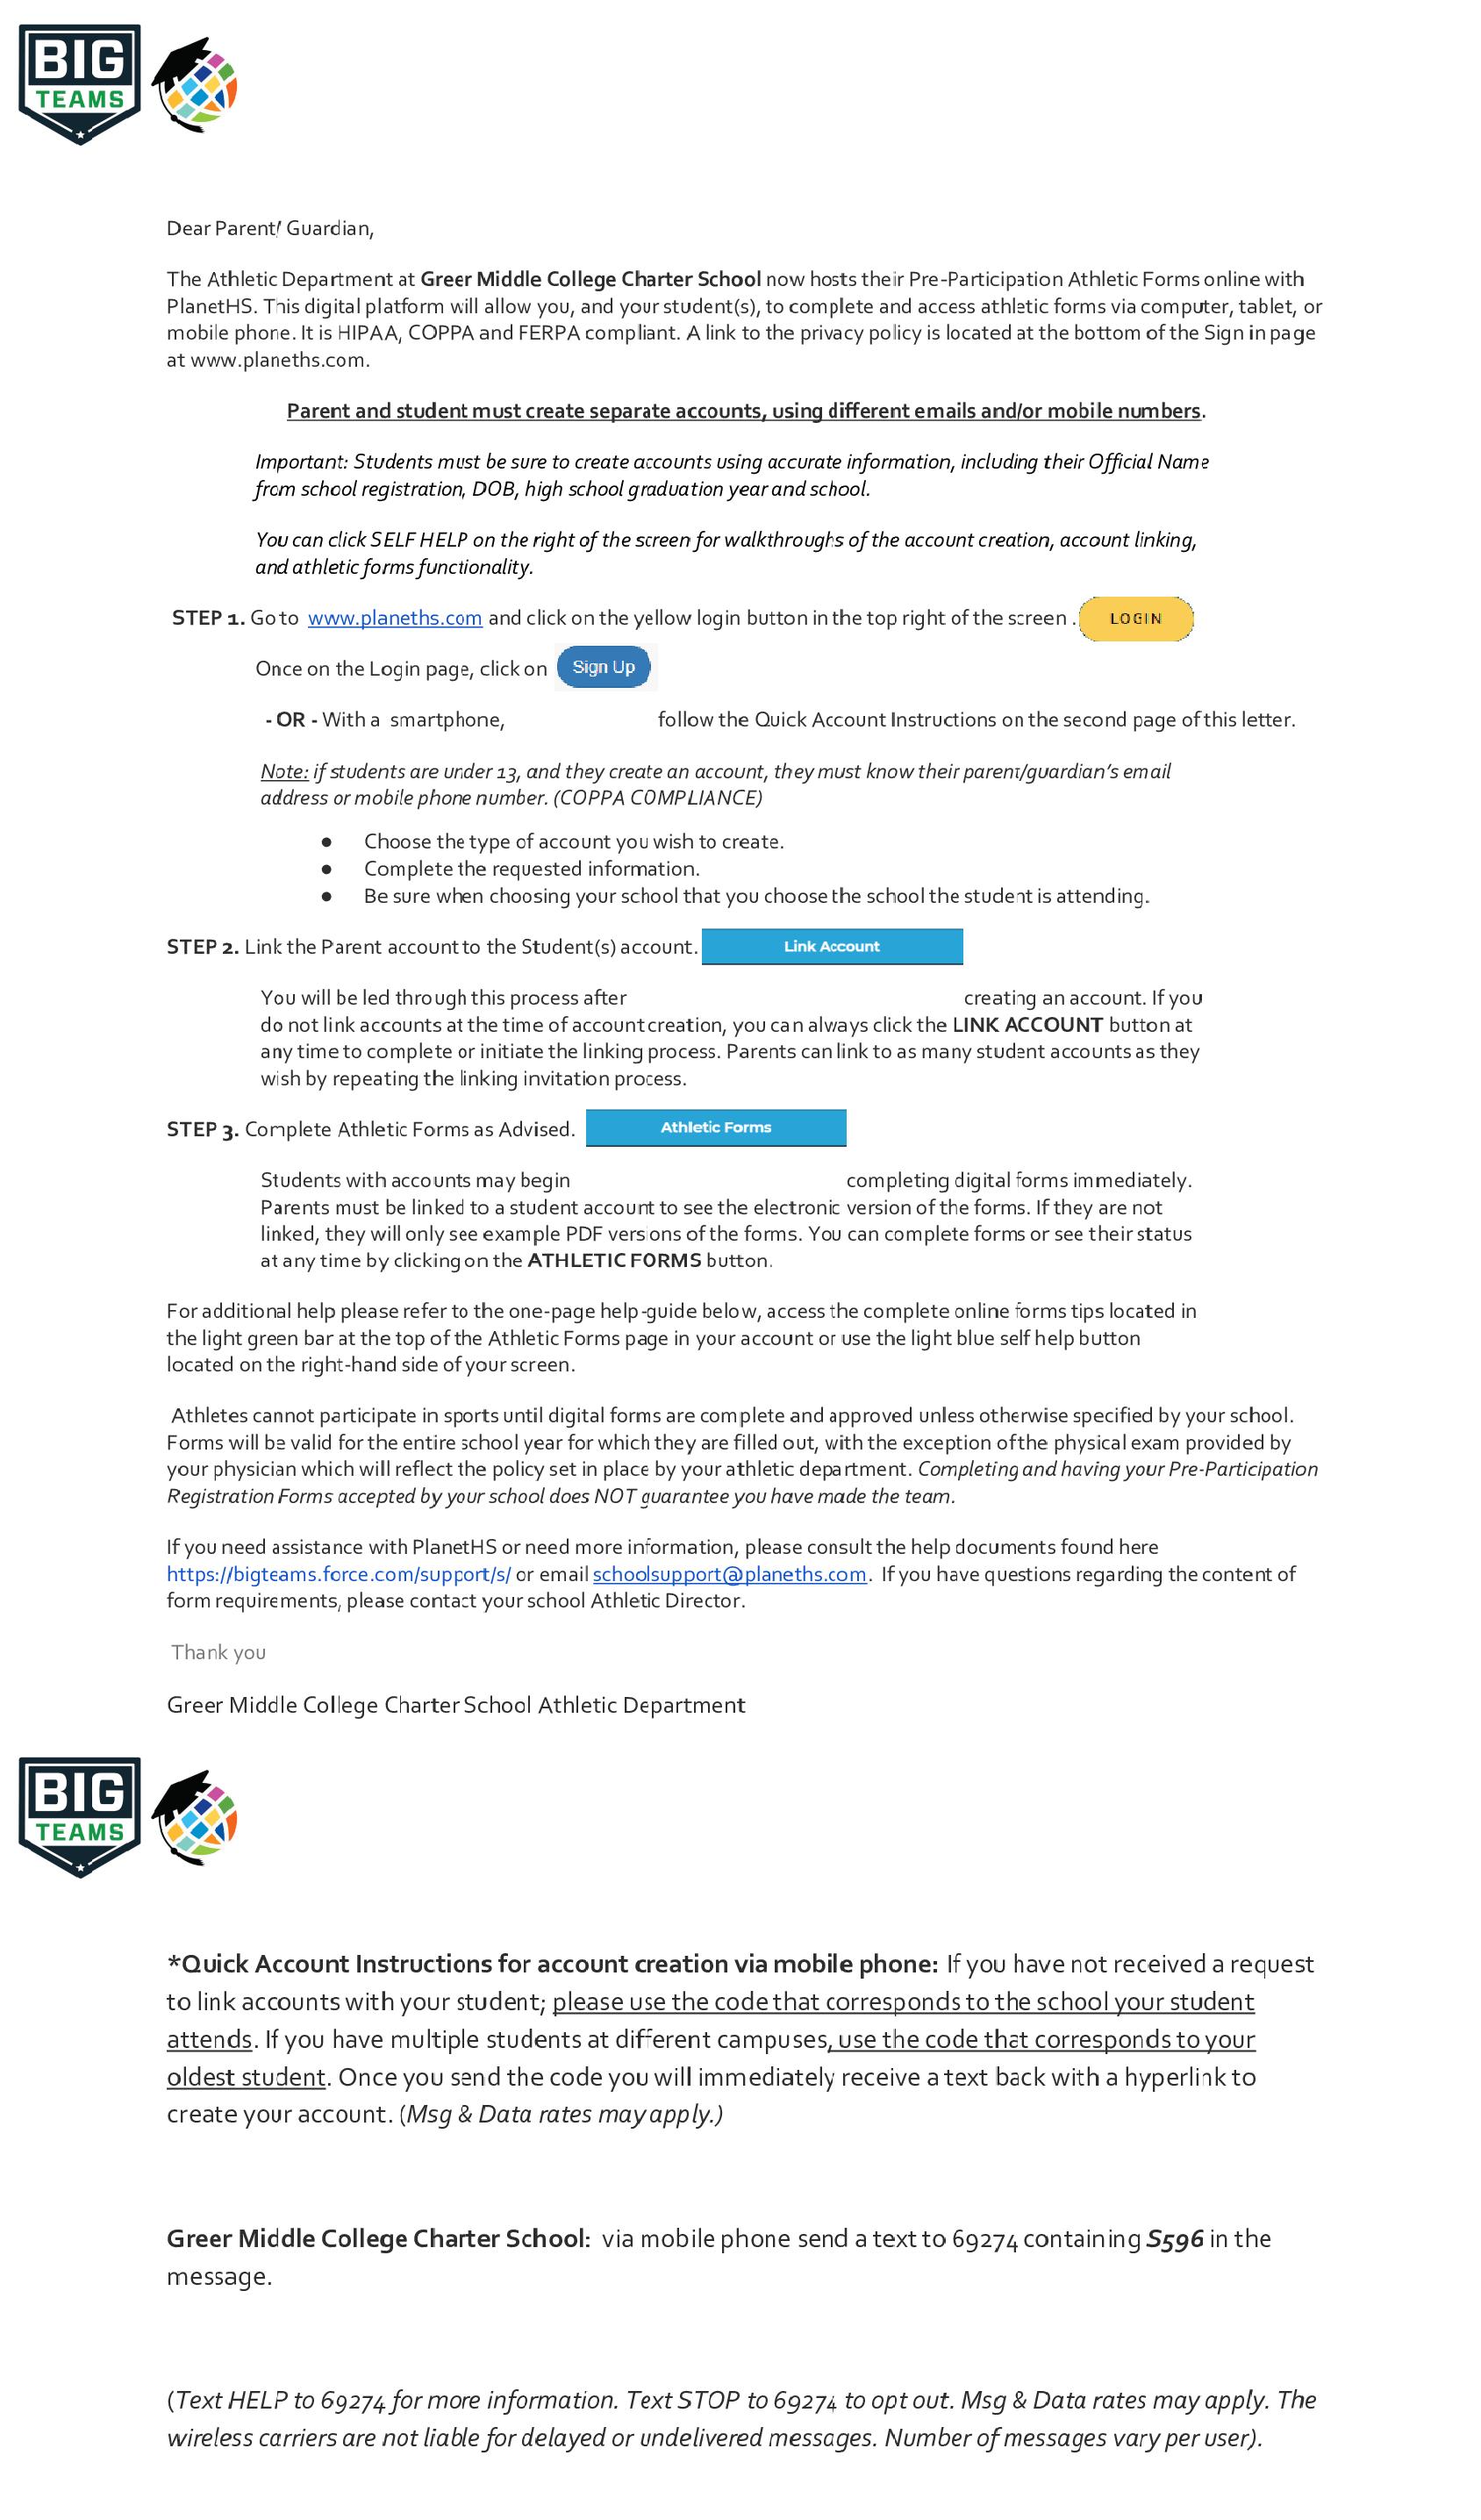 GMC Pre-Participation Forms Procedure